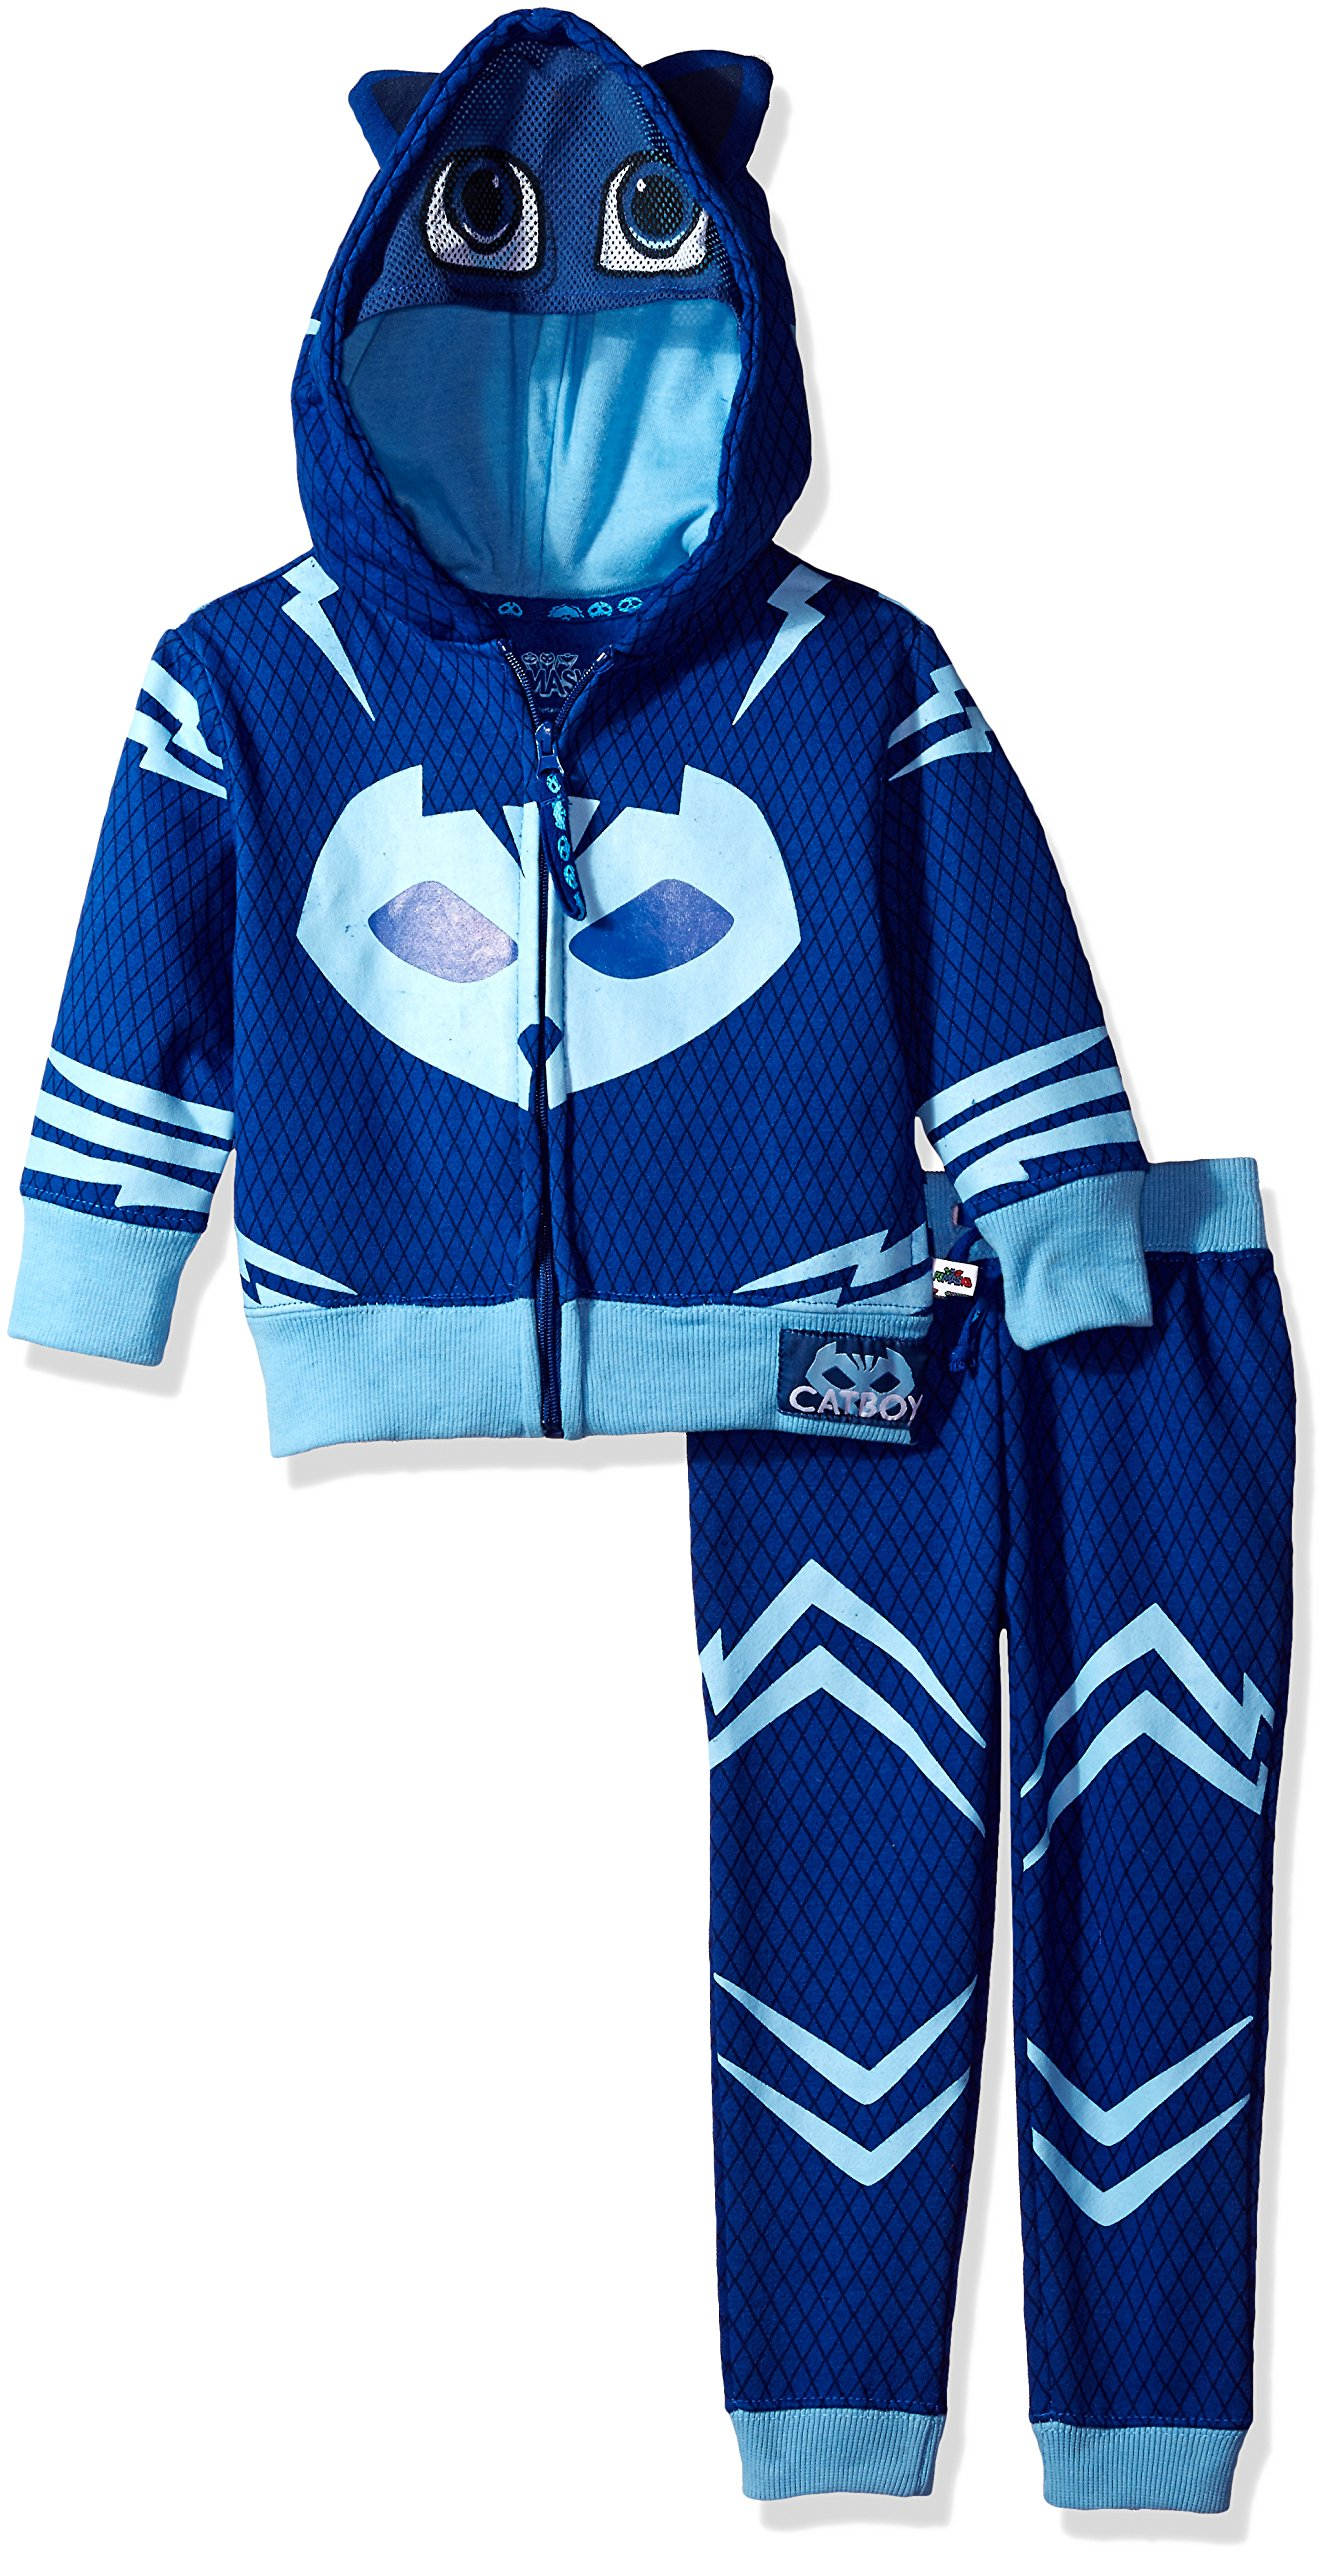 PJMASKS Little Boys' Catboy Hoodie and Jogger Set, Blue, 4